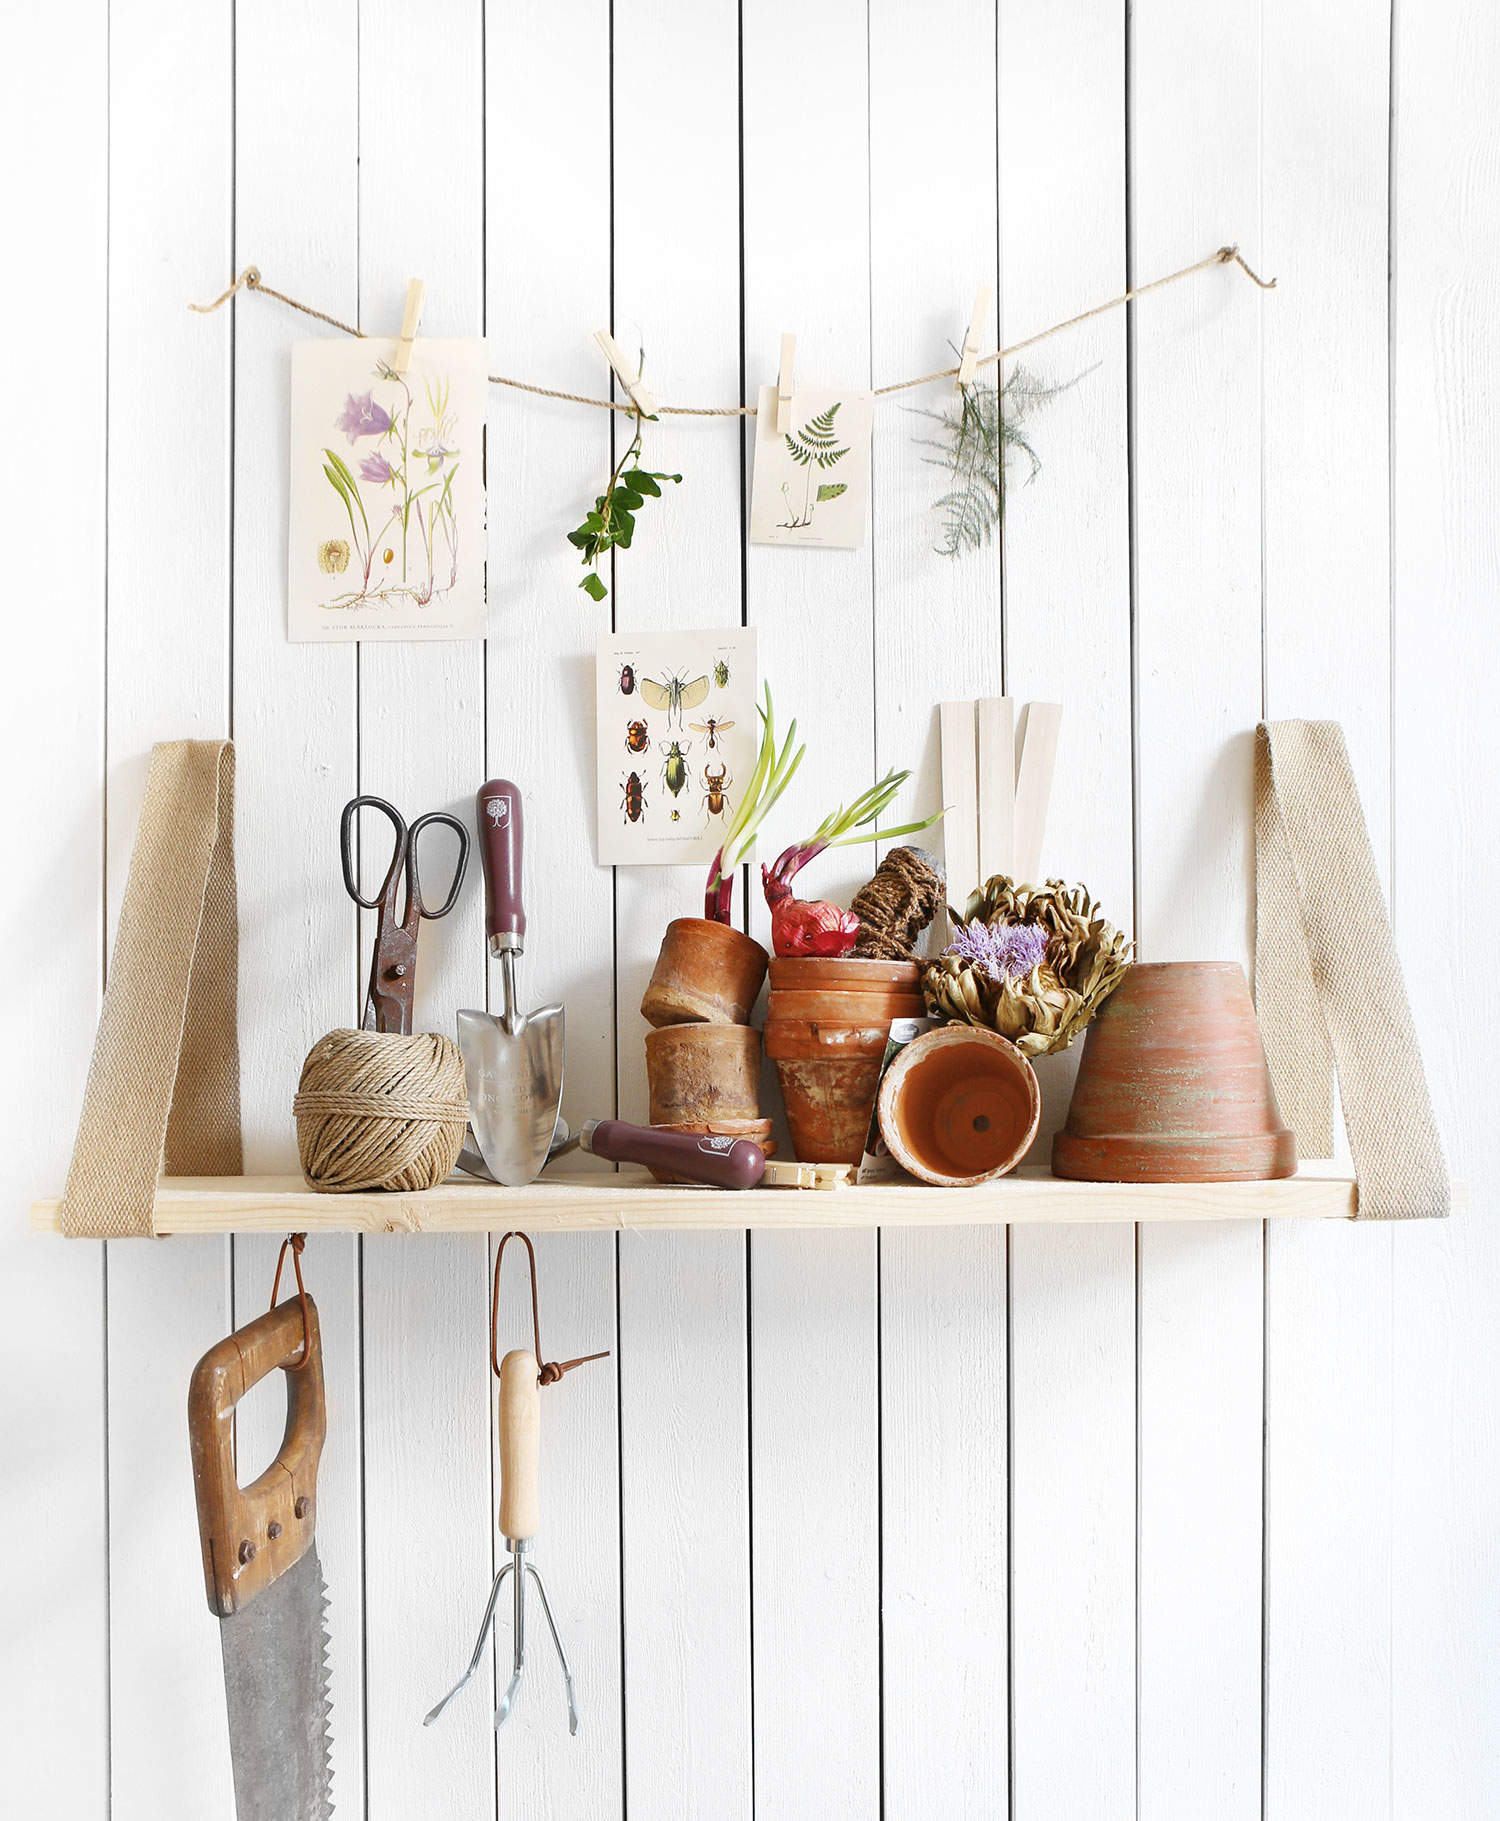 trädgårdshylla-dragarbild-start-hemmafix-monica-karlstein